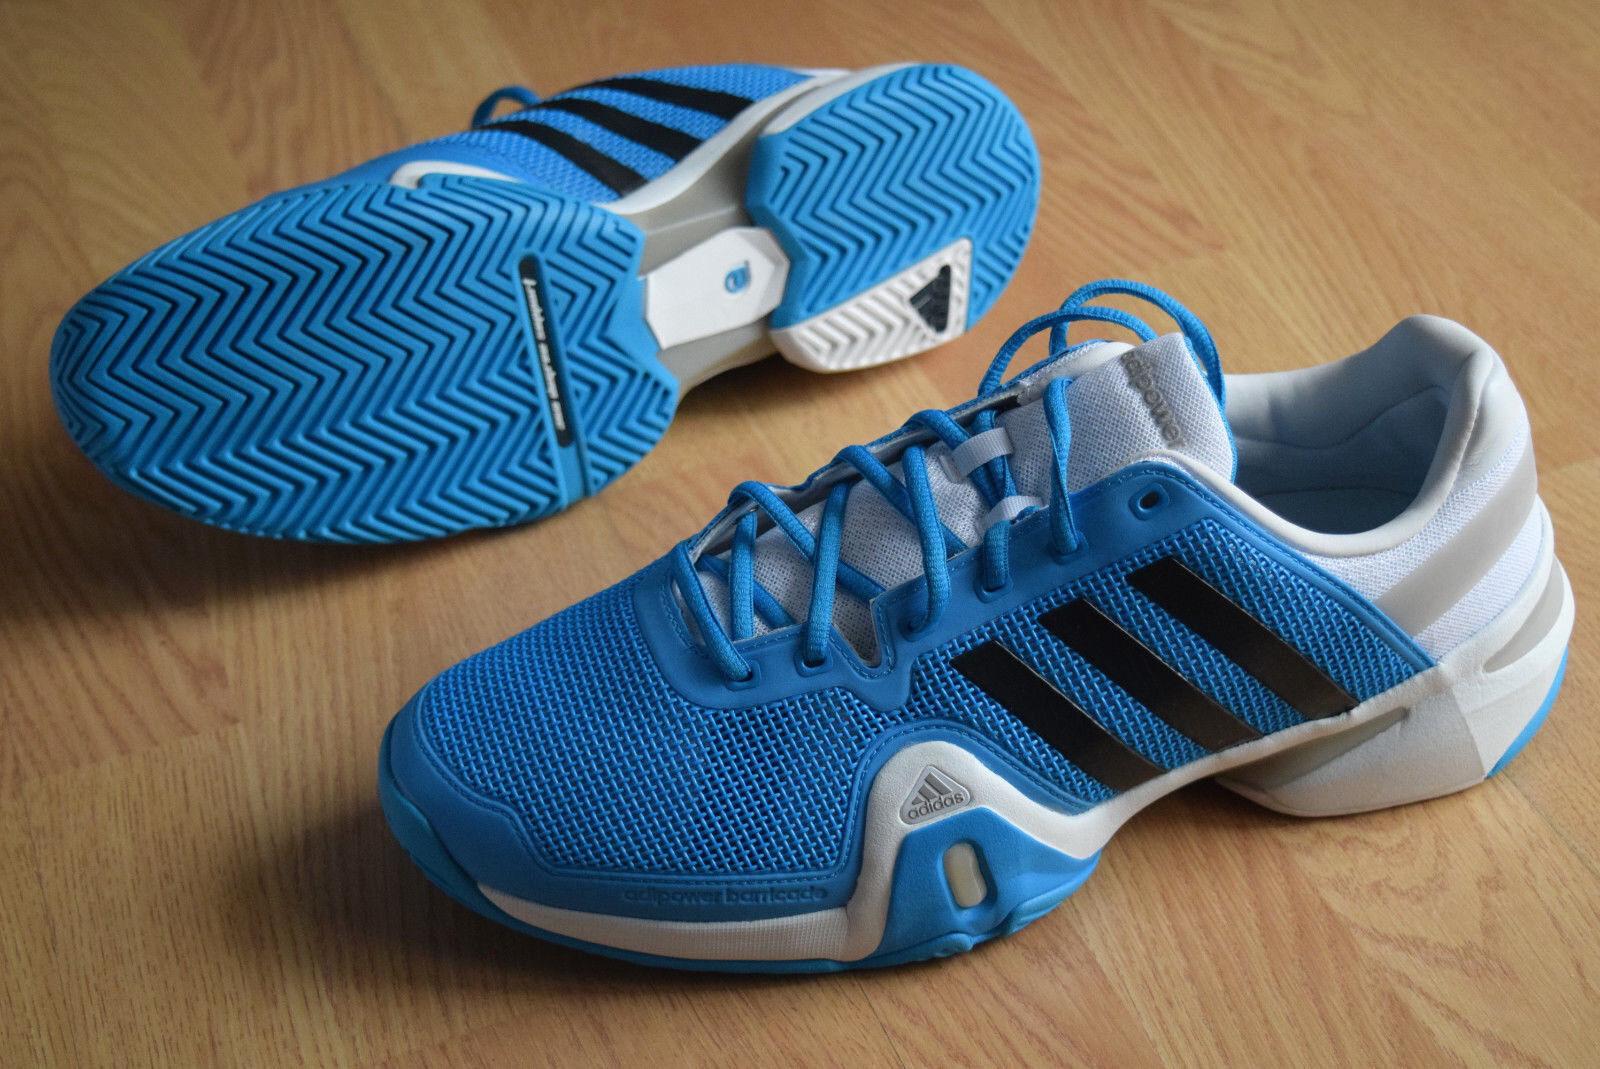 adidas Barricade 49 adipower 8 Clay 48 49 Barricade Tennis F32332 2015 Tennisschuhe b33c03